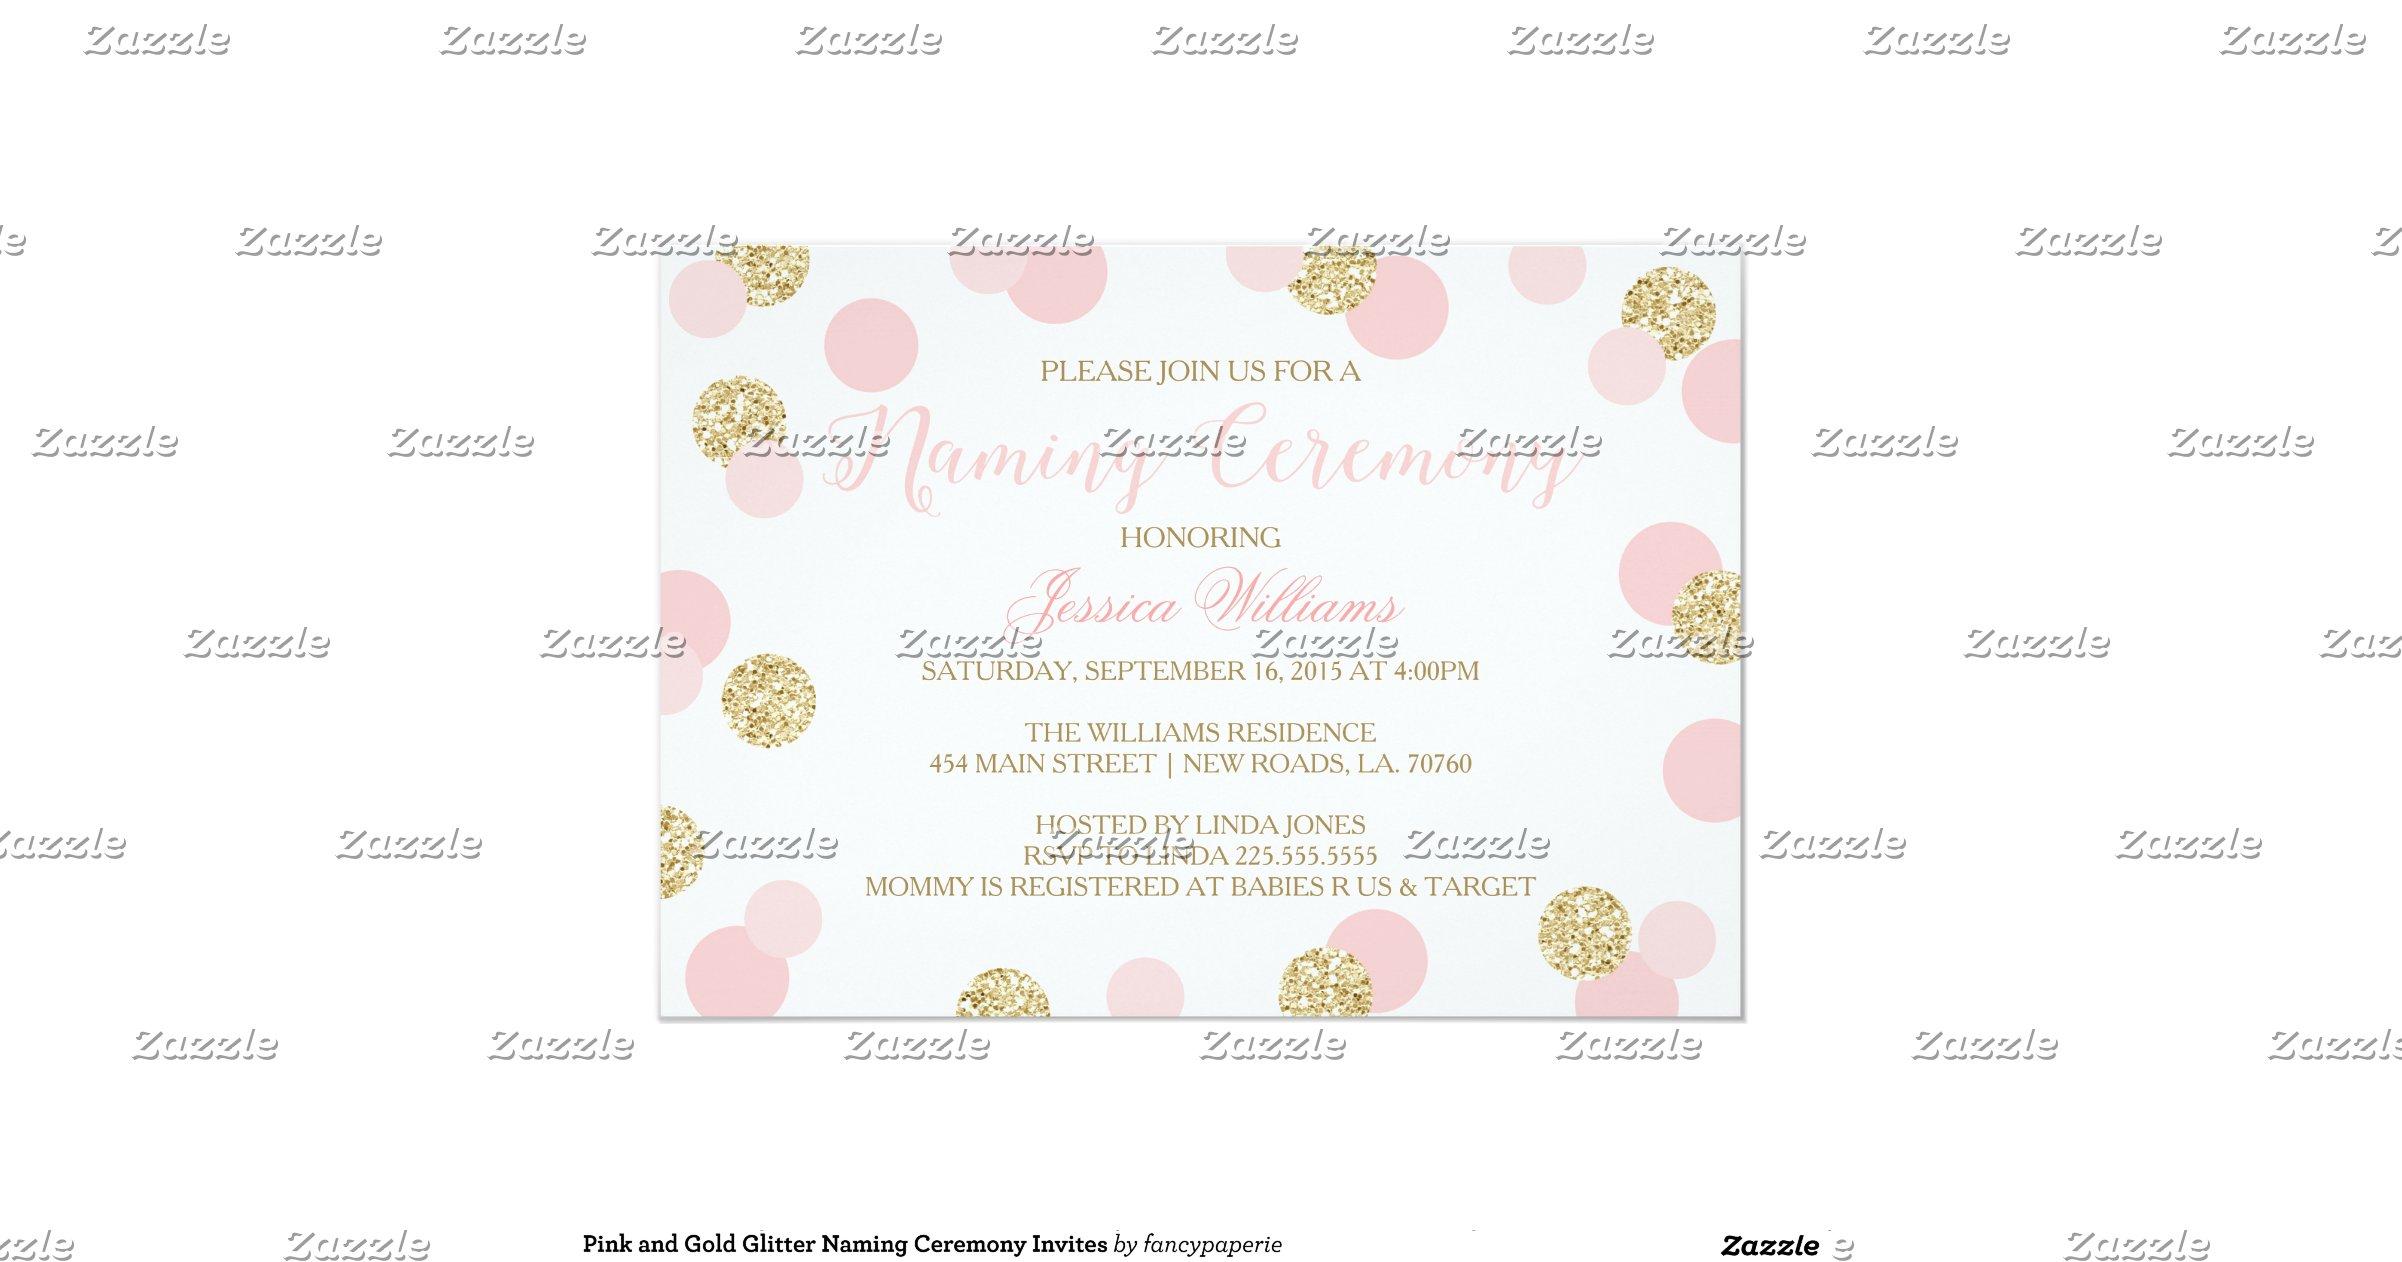 Naming ceremony invitation templates free 576191 hitori49fo family reunion party invitations and letters ipv studio maxwellsz